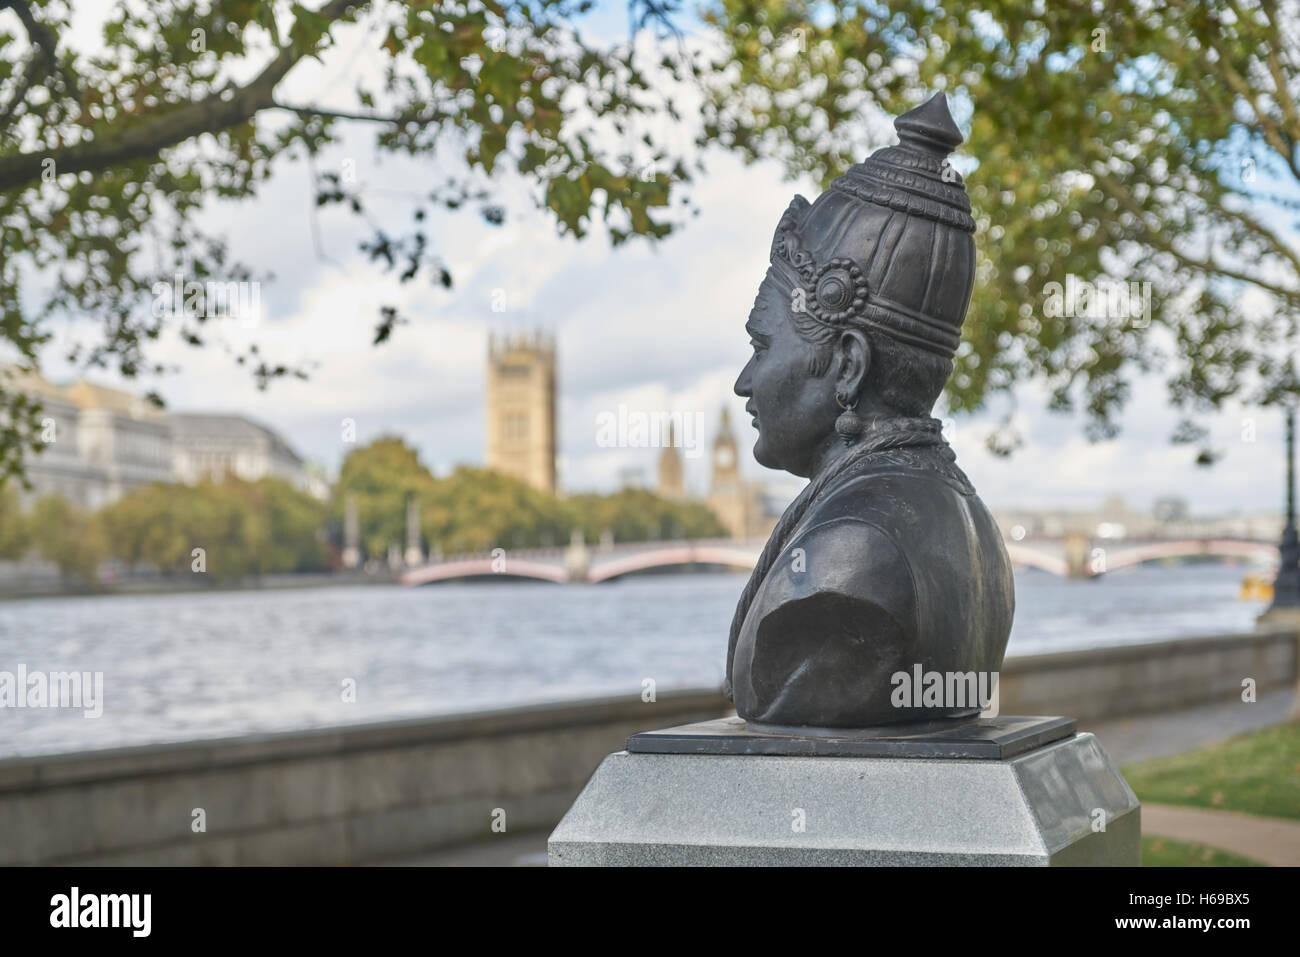 statue of Basava  12th-century Indian philosopher  London - Stock Image